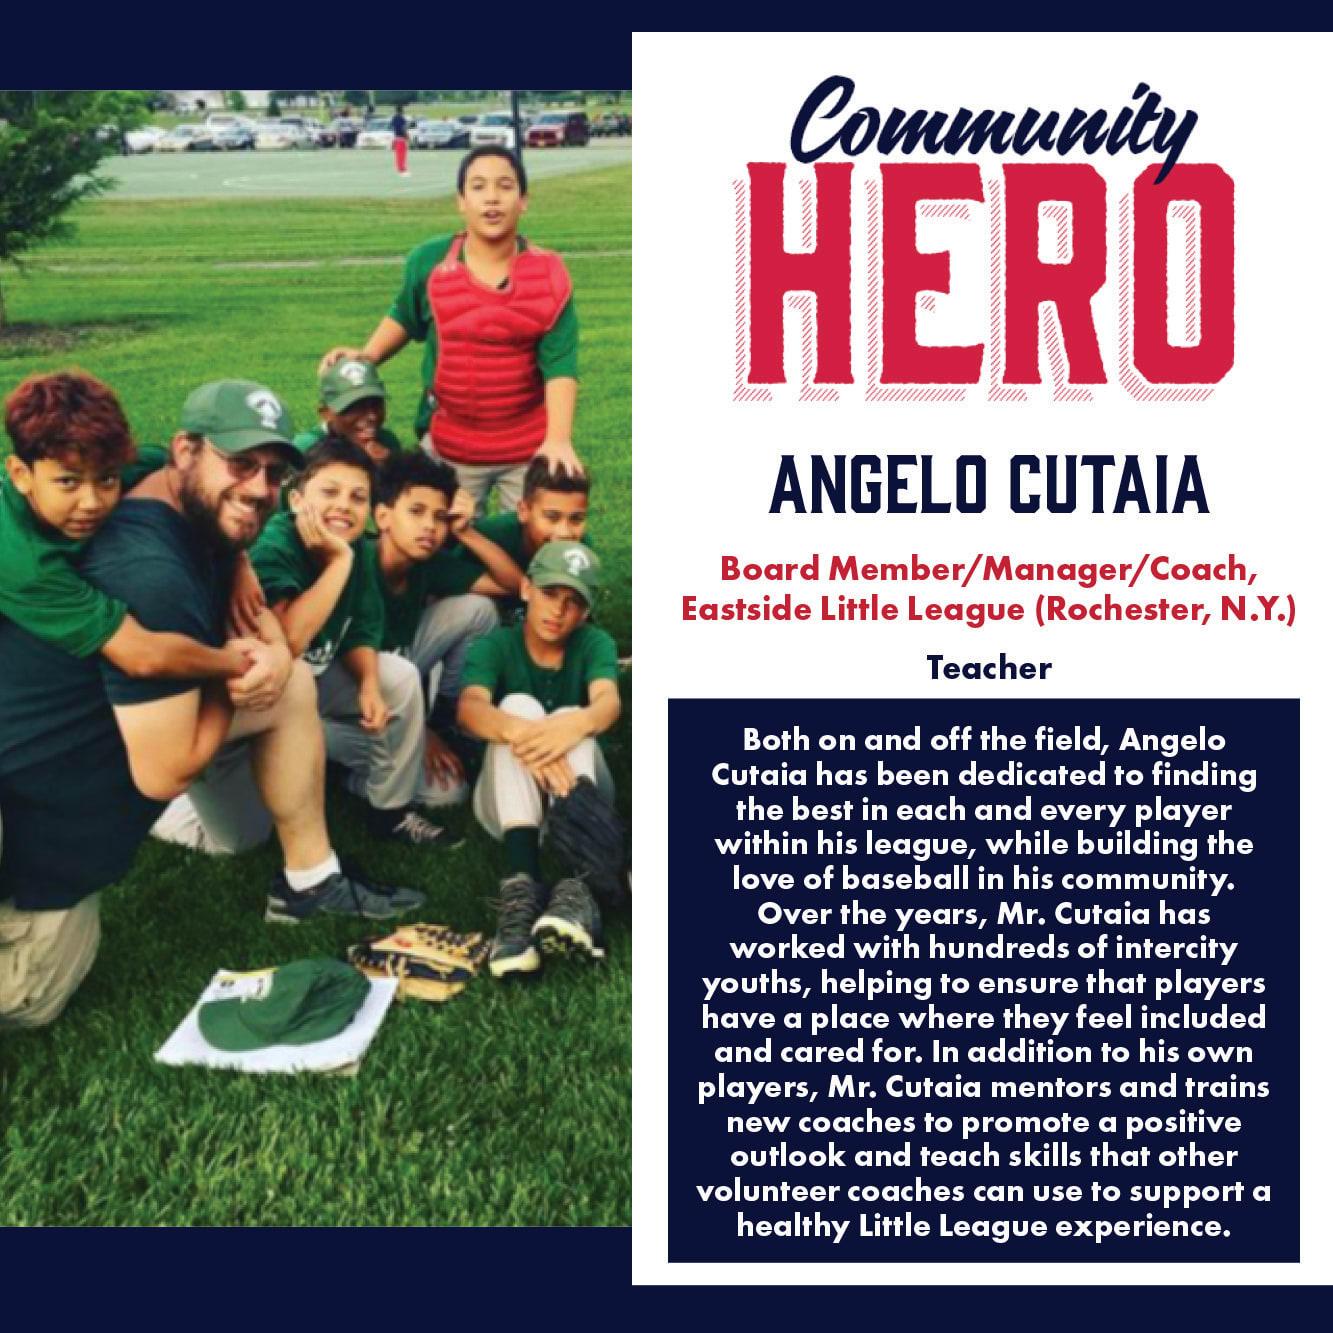 Angelo Cutaia Community Hero